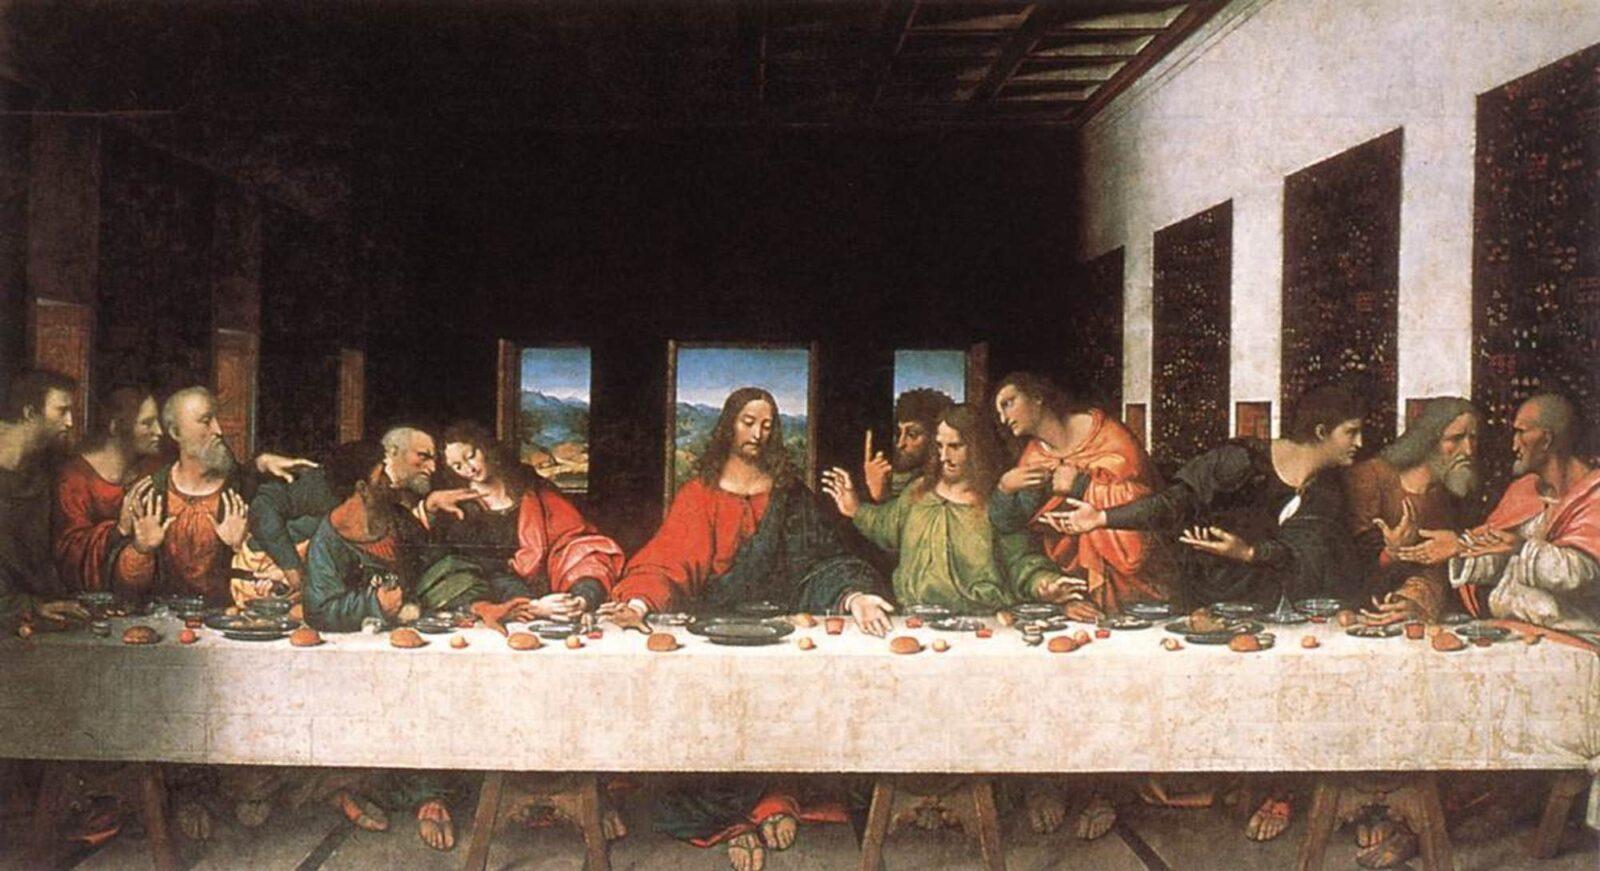 Leonardo da Vinci Painted a Secret Copy of 'The Last Supper' and It Still Exists